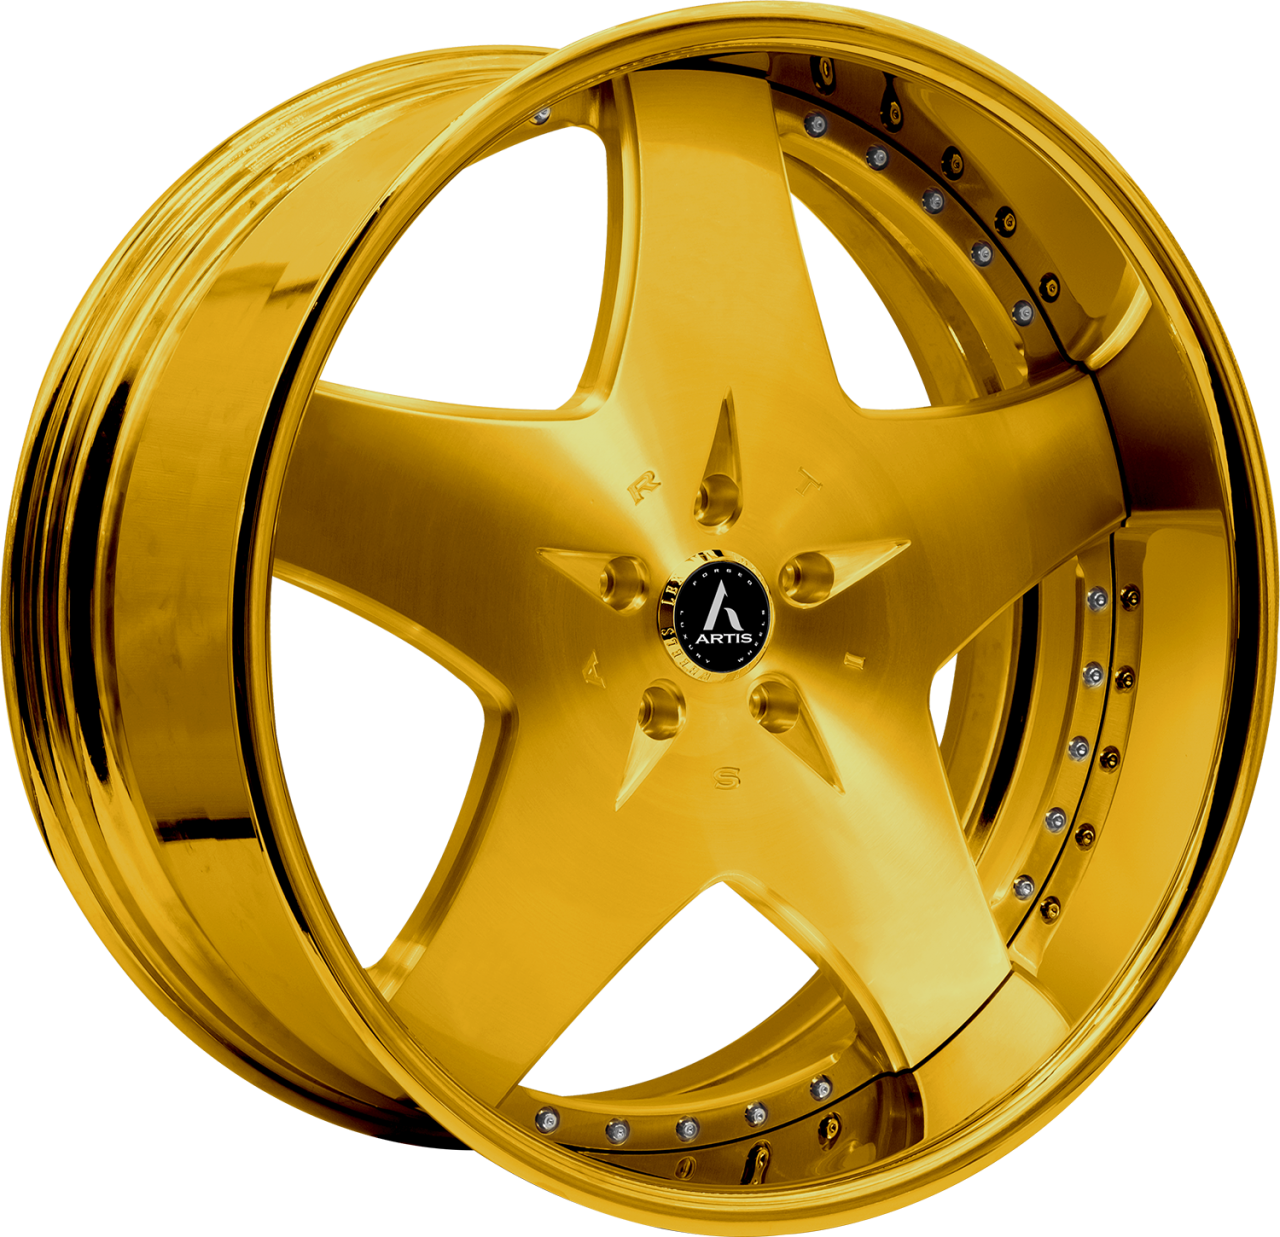 Artis Forged Cashville wheel with Custom Gold finish